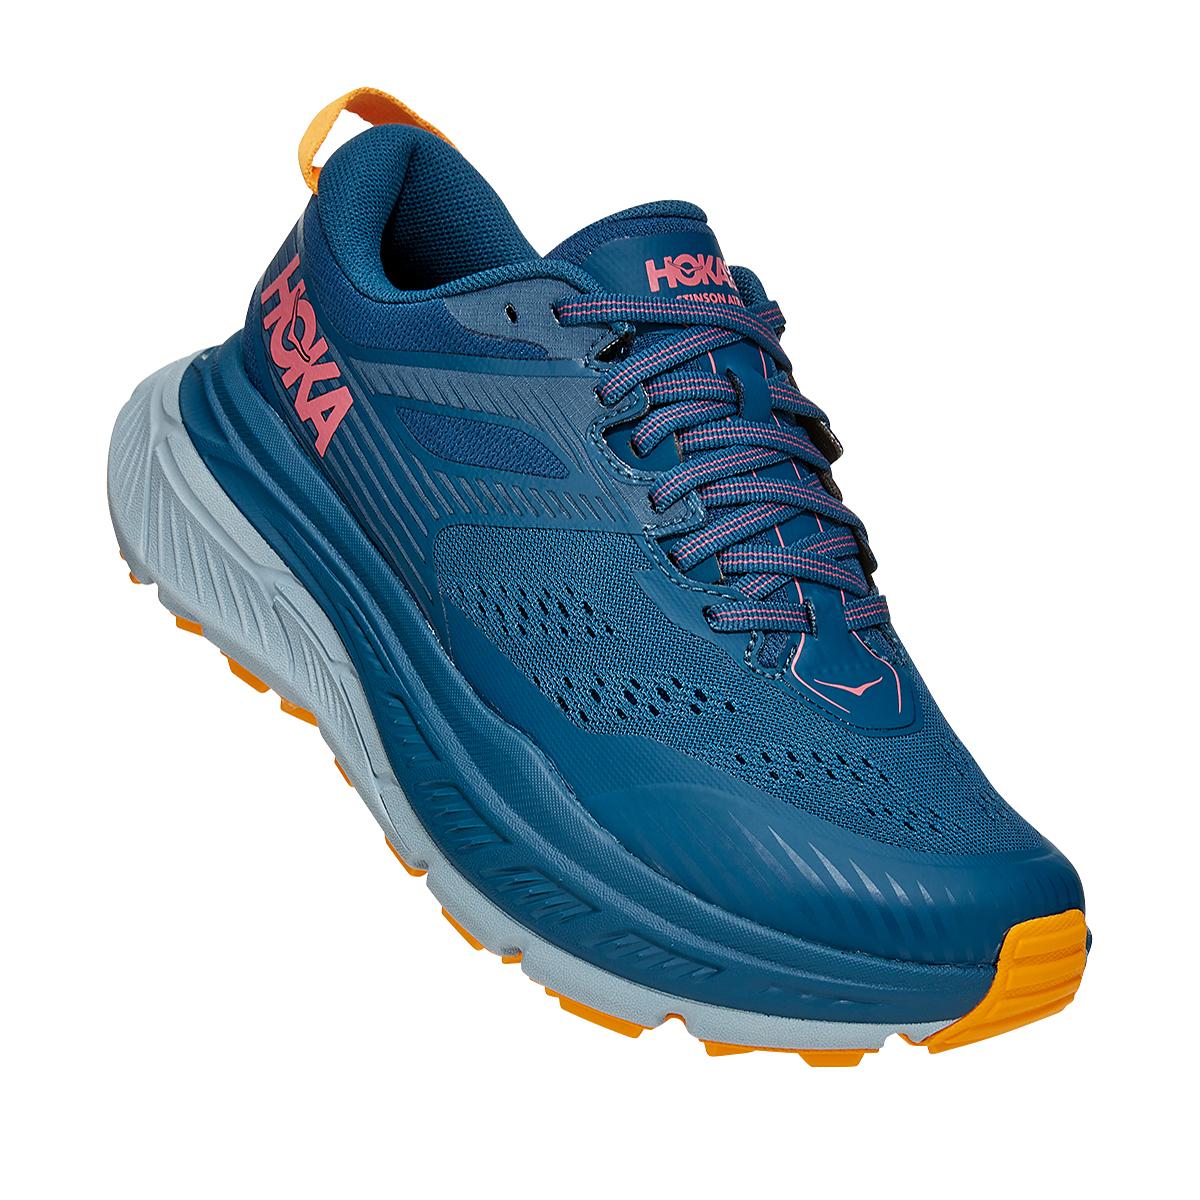 Women's Hoka One One Stinson ATR 6 Trail Running Shoe - Color: Moroccan Blue/Saffron - Size: 5 - Width: Regular, Moroccan Blue/Saffron, large, image 2